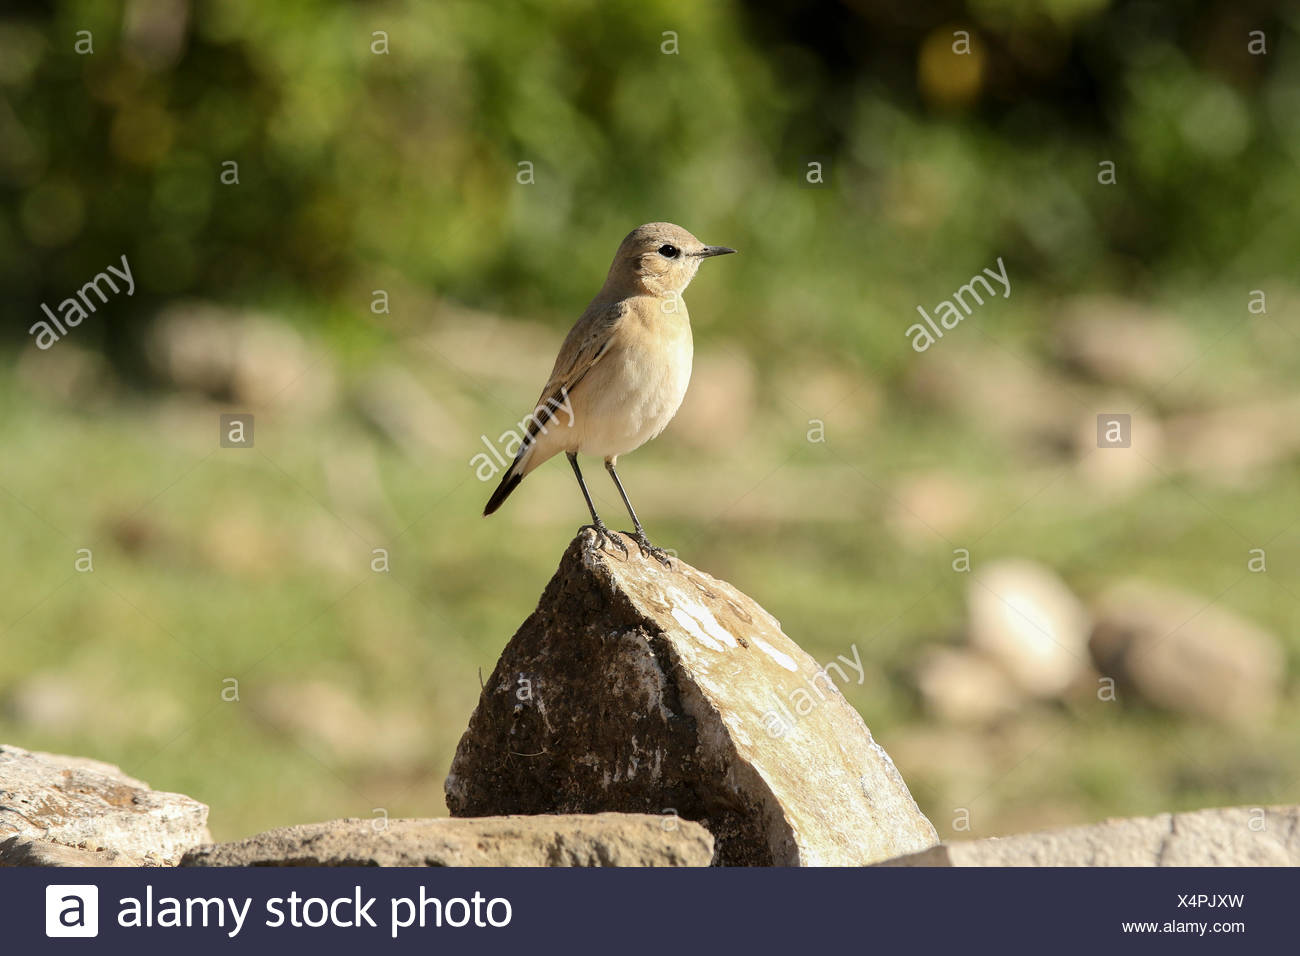 Isabelline Wheatear, Oenanthe isabellina, perching on rock. - Stock Image